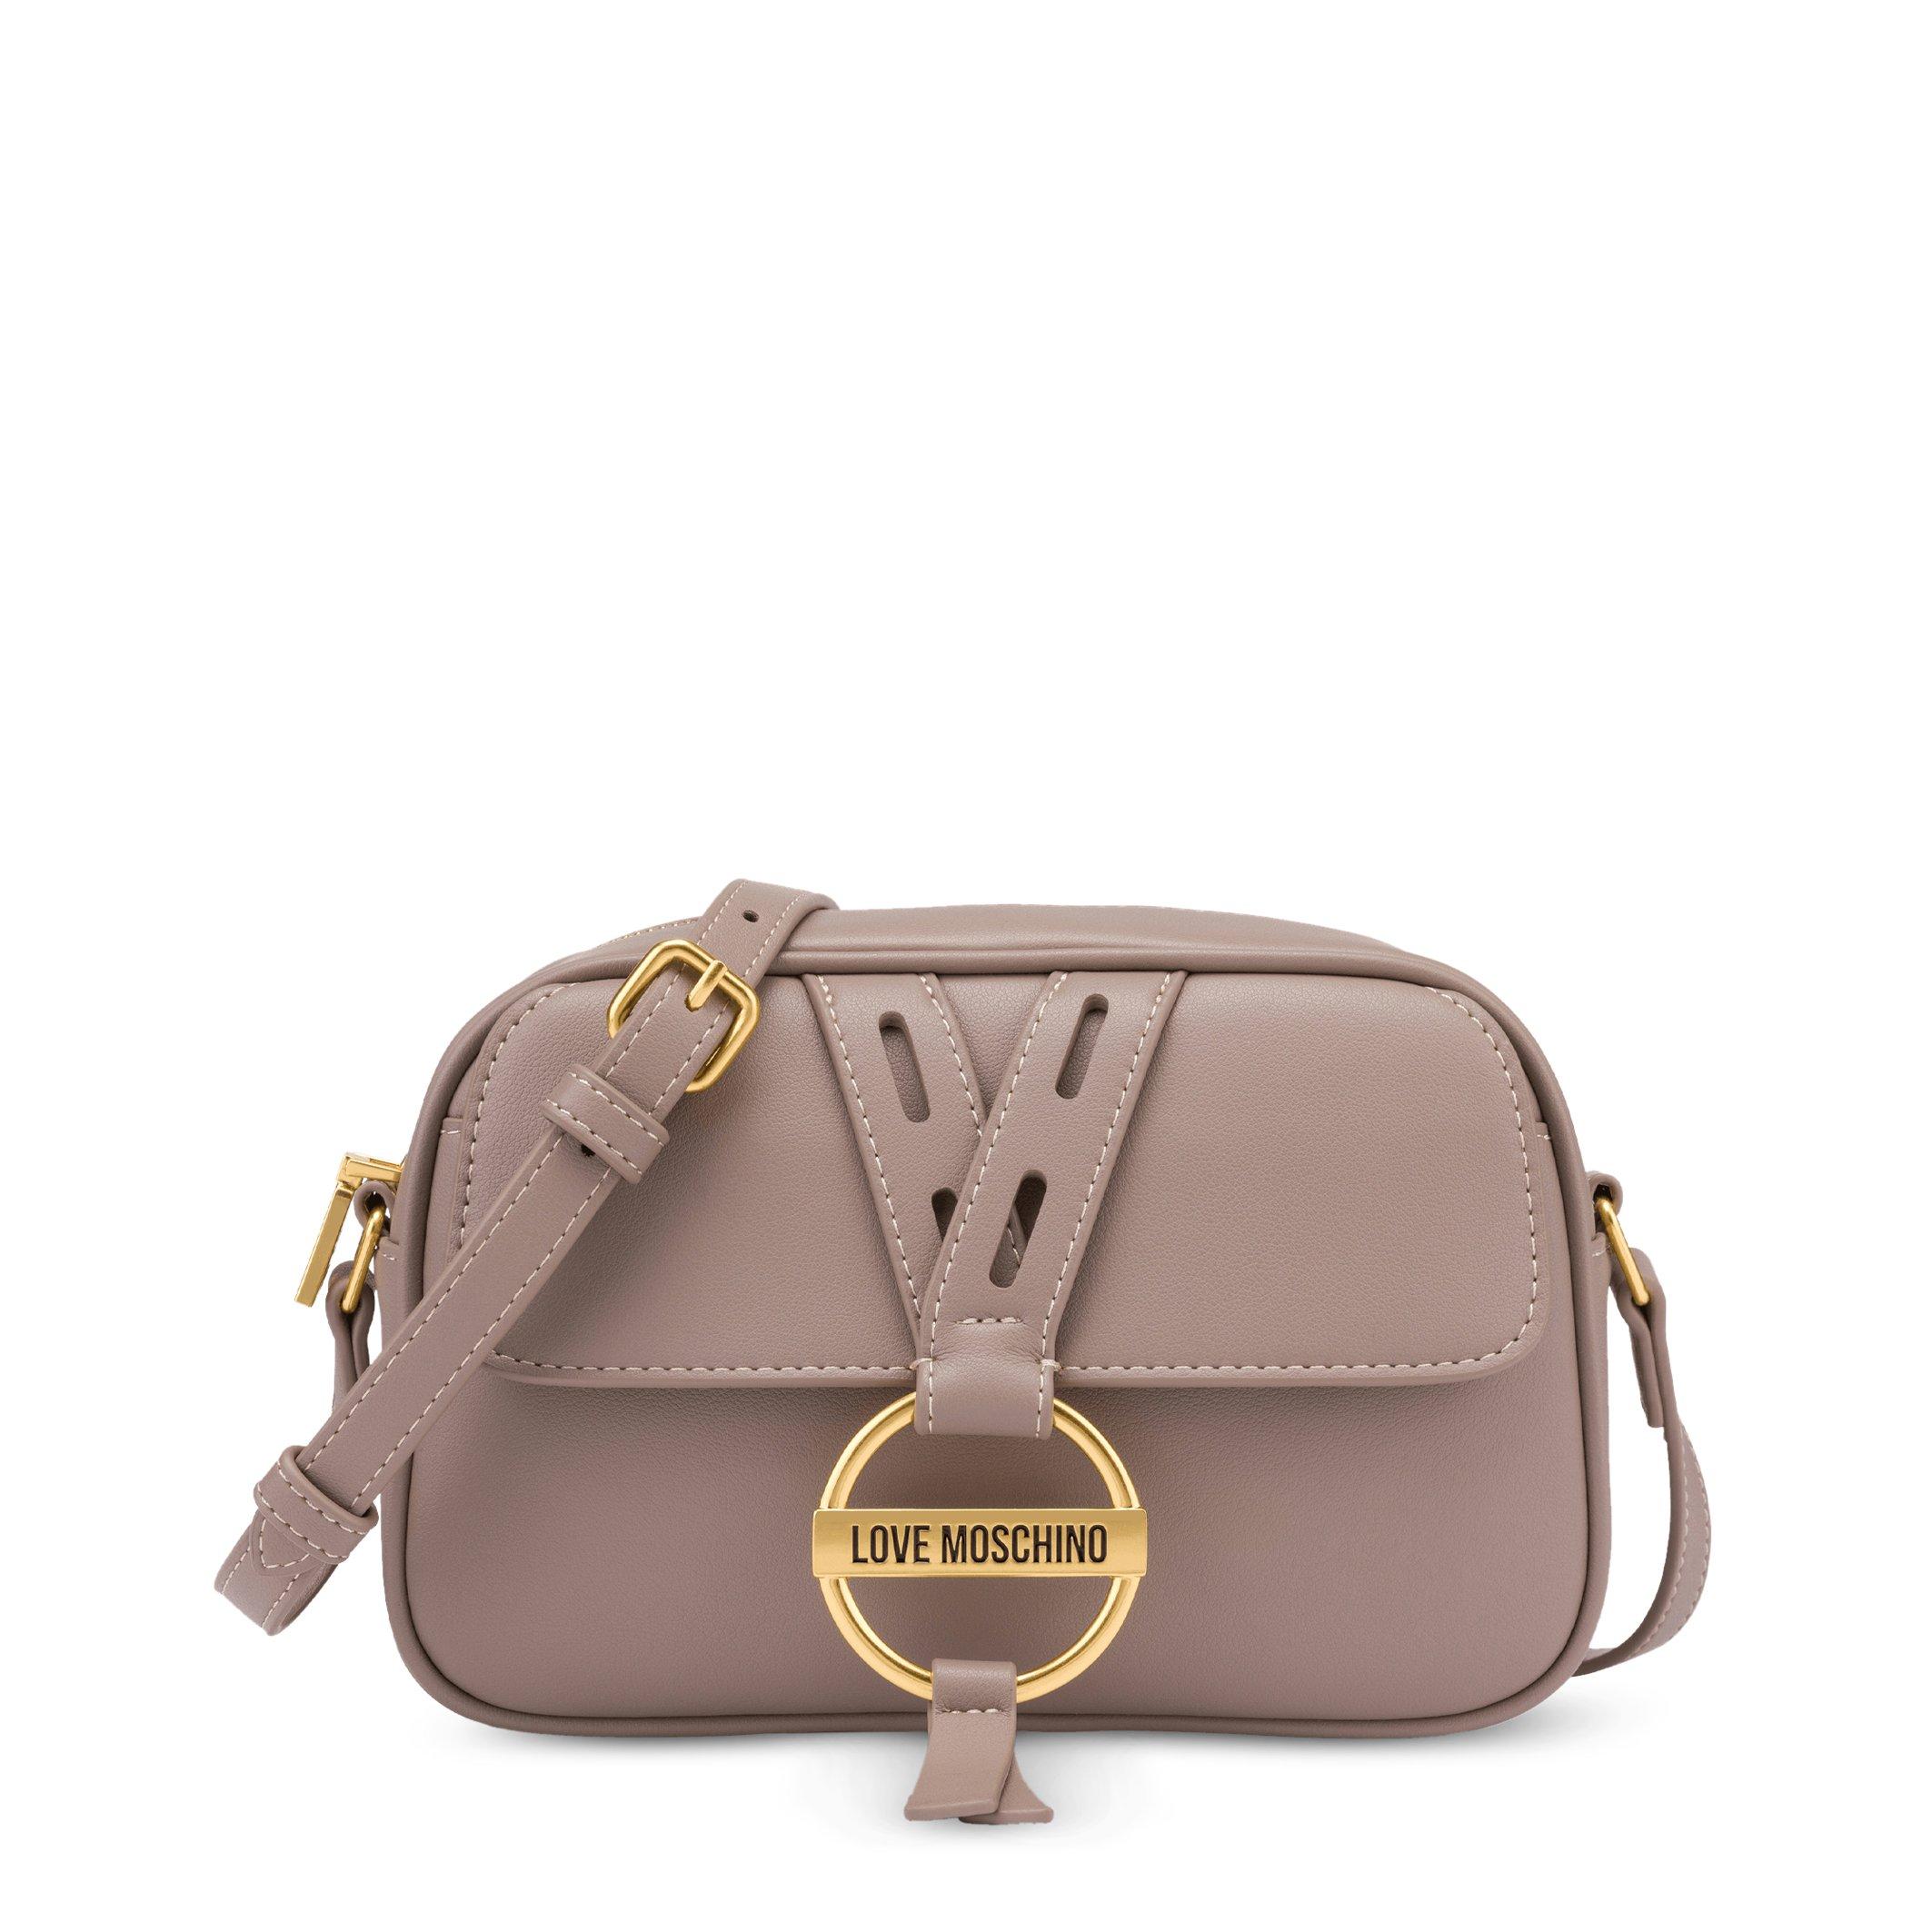 Love Moschino Women's Crossbody Bag Various Colours JC4201PP1DLK0 - grey NOSIZE